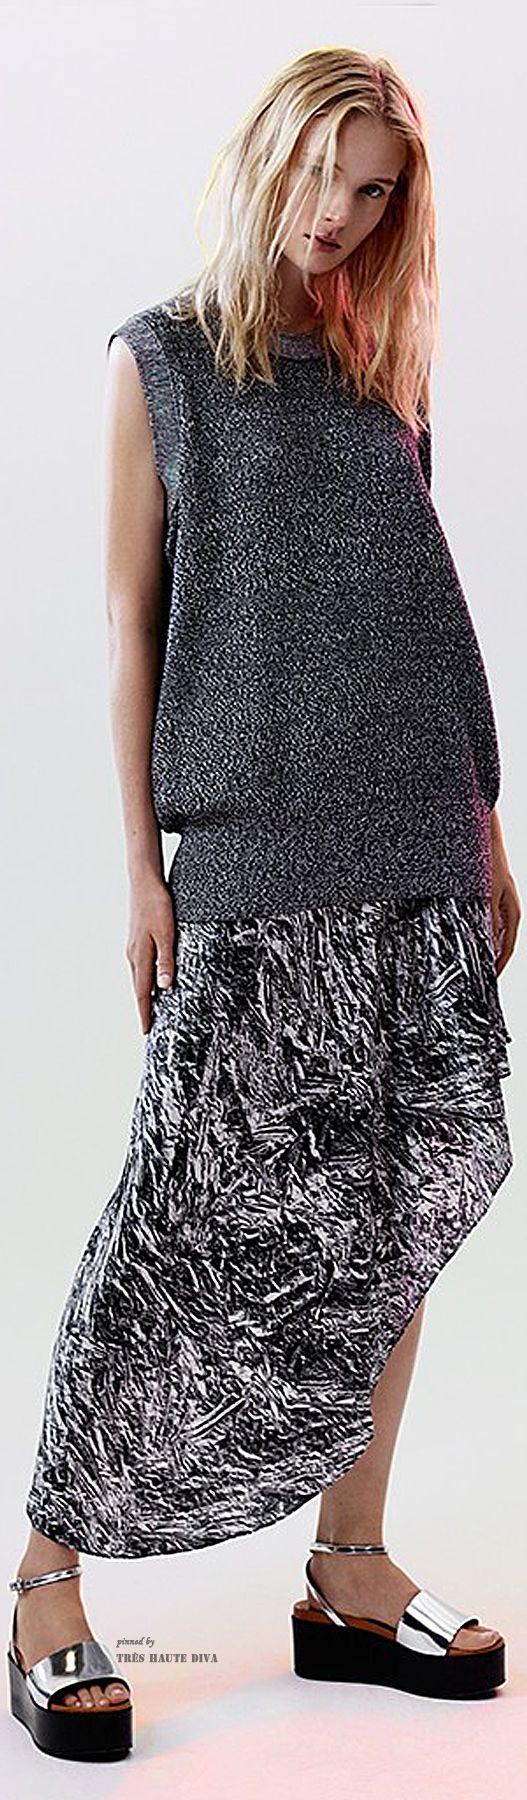 #LFW McQ by Alexander McQueen S/S 2015